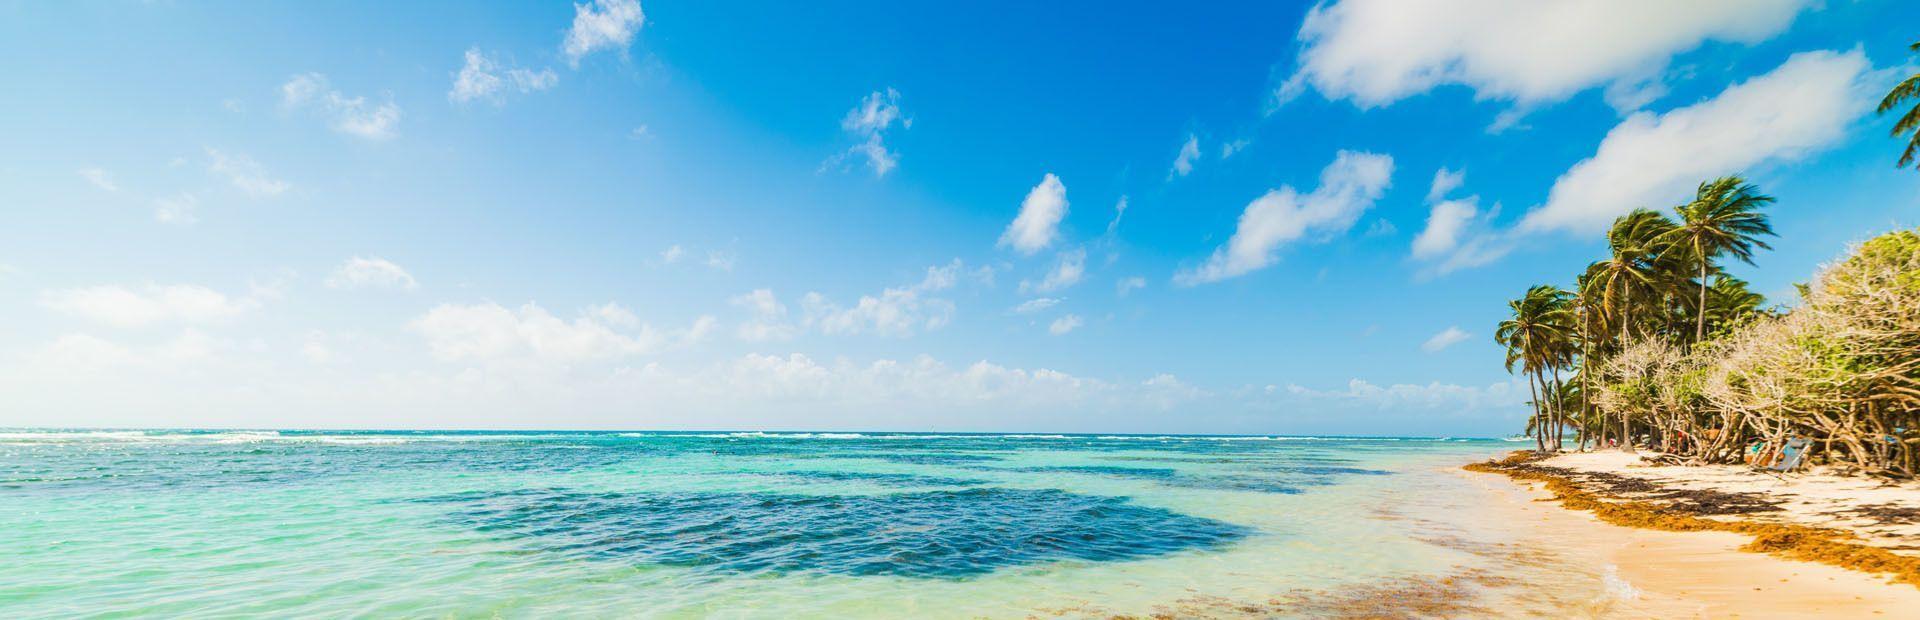 Guadeloupe beachlife: spiagge delle Antille Francesi e Mar dei Caraibi